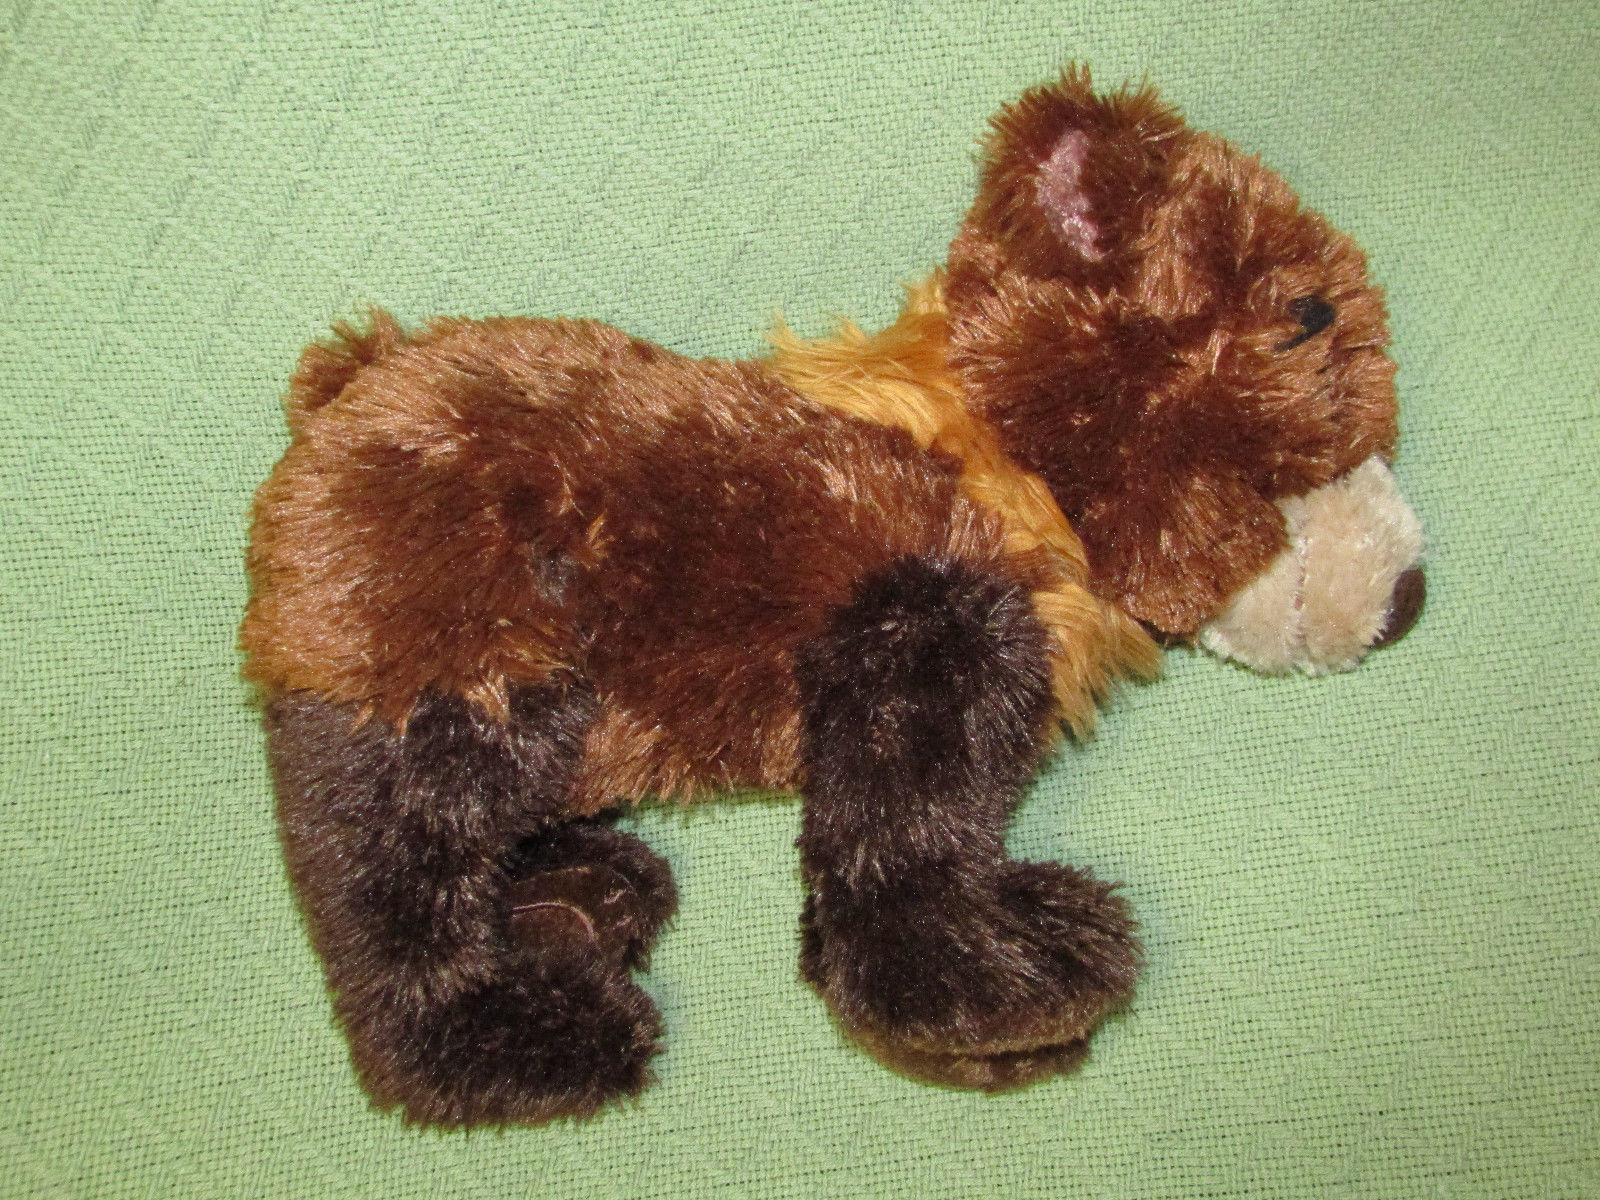 "Disney Brother Bear KODA Plush Brown Bear Floppy Bean Bag Stuffed Animal 12"" Toy image 4"